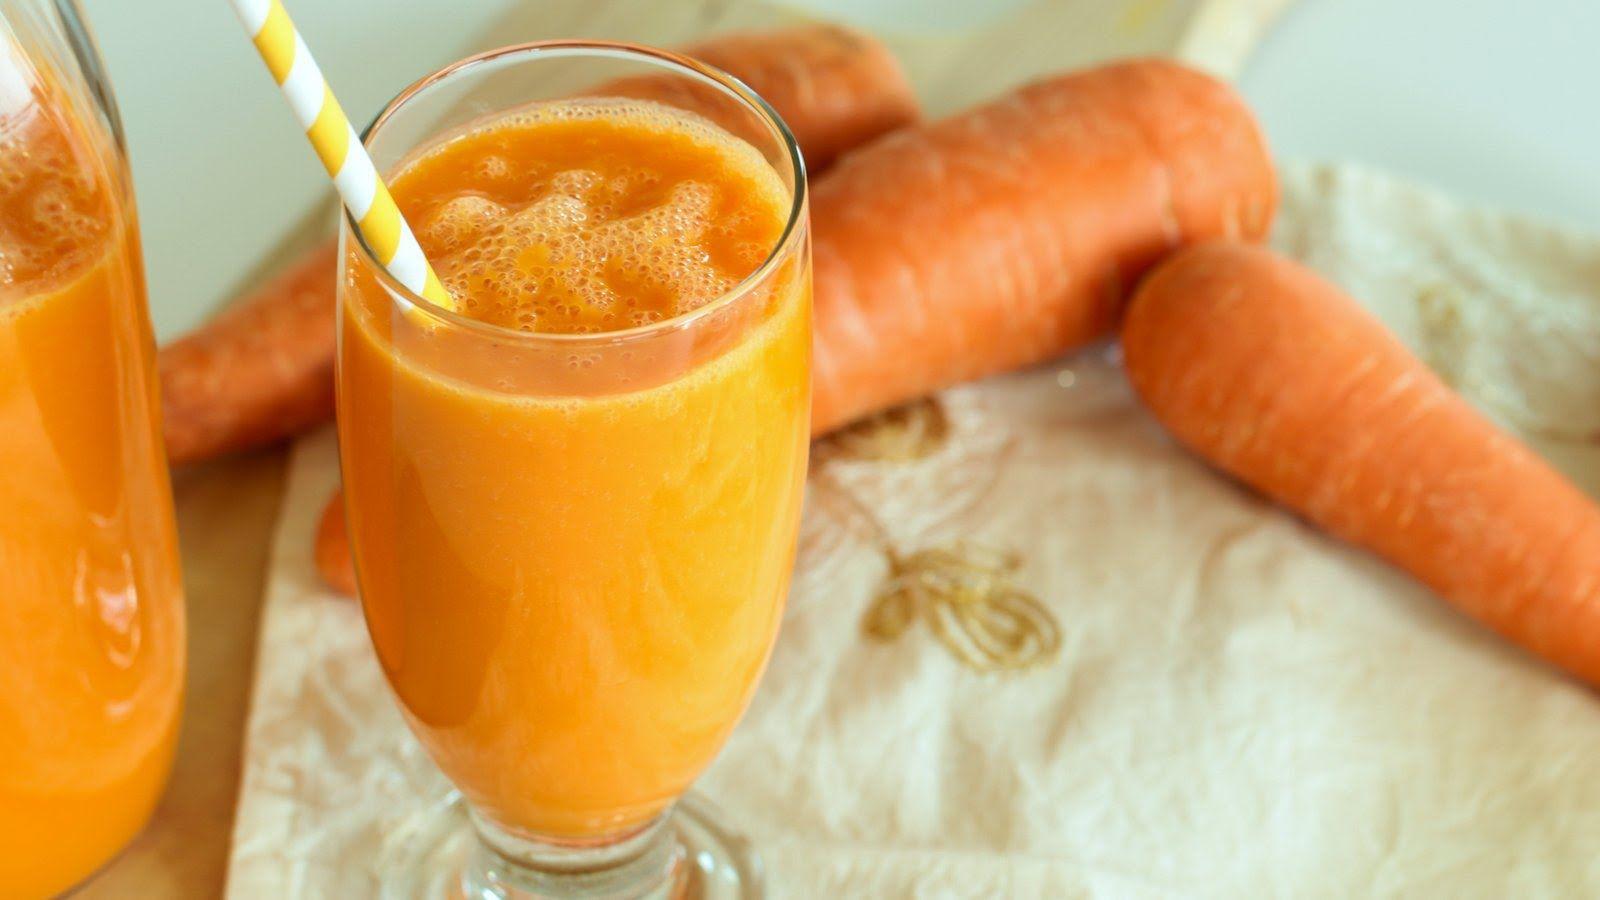 Carrot Orange Smoothie عصير الجزر و البرتقال Cookingwithalia Episode 382 Healthy Sweeteners Cooking Pumpkin Orange Smoothie